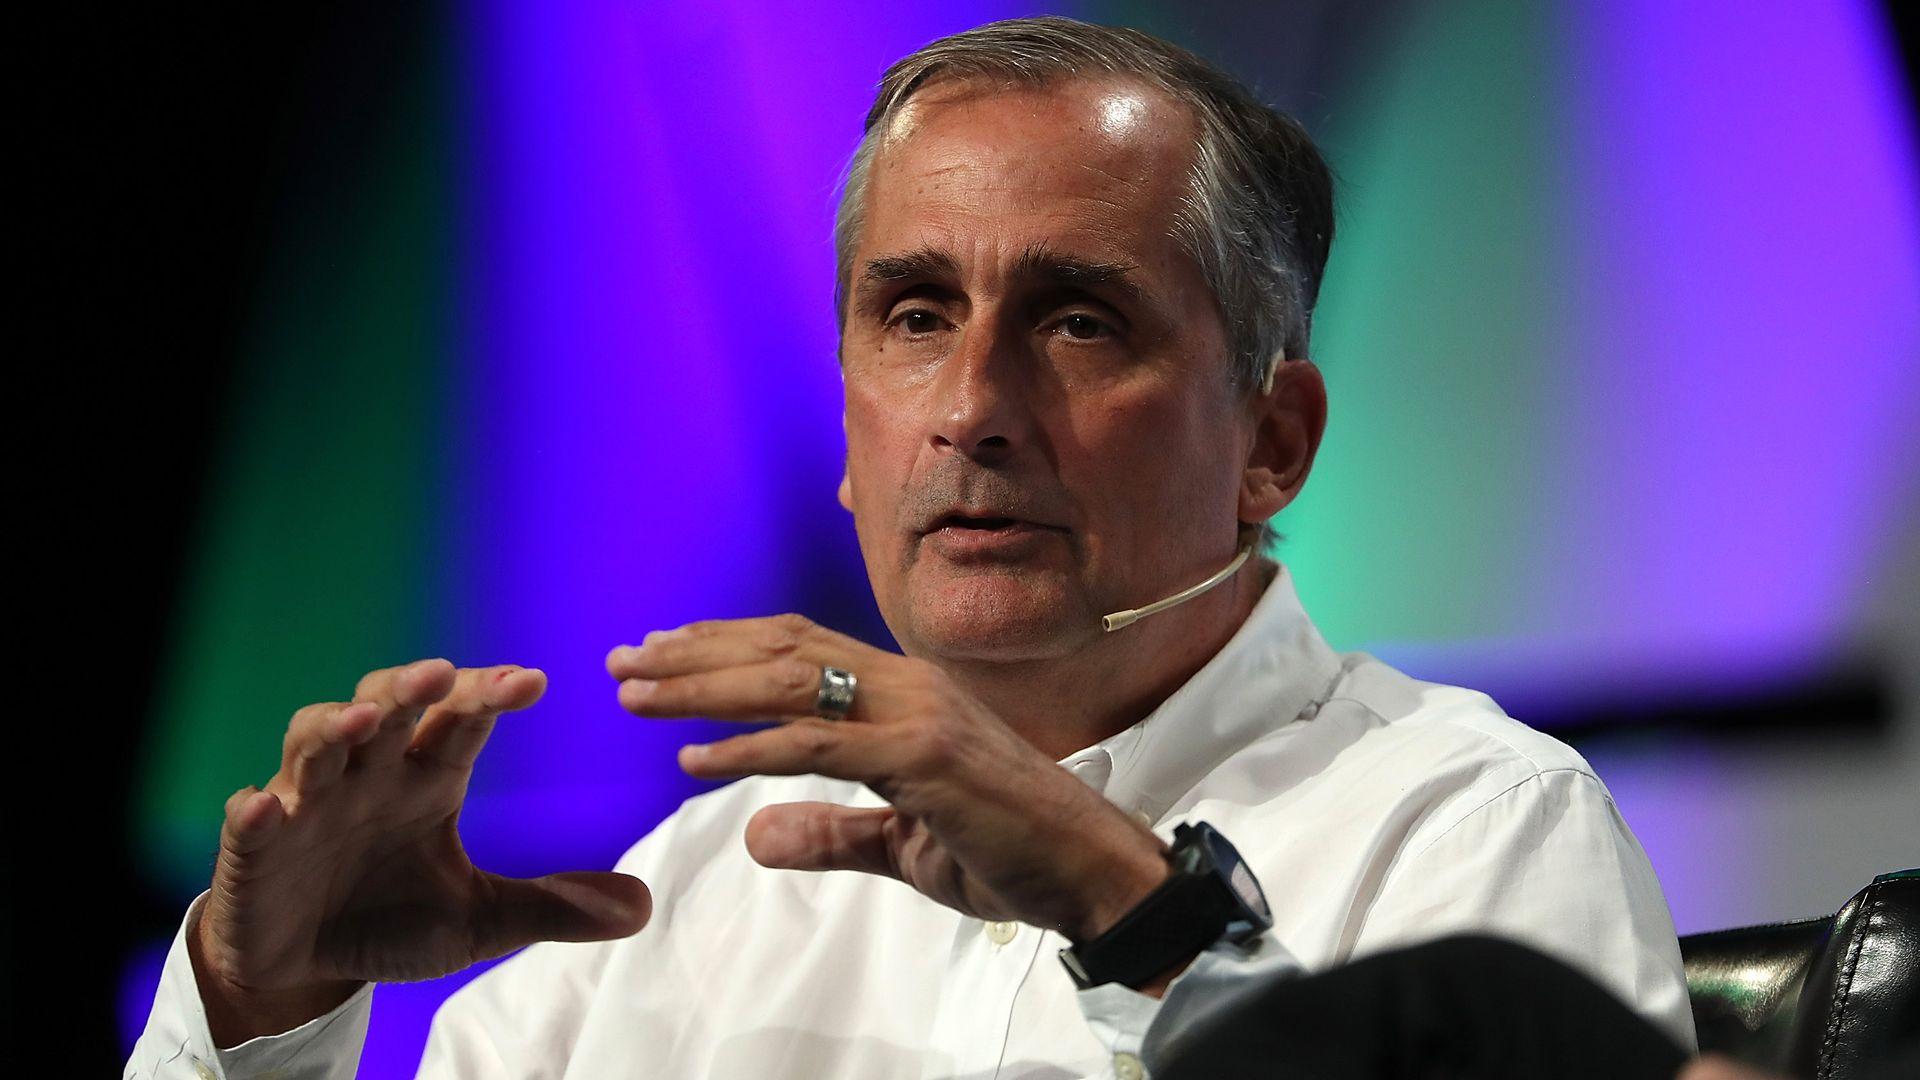 CEO Brian Krzanich